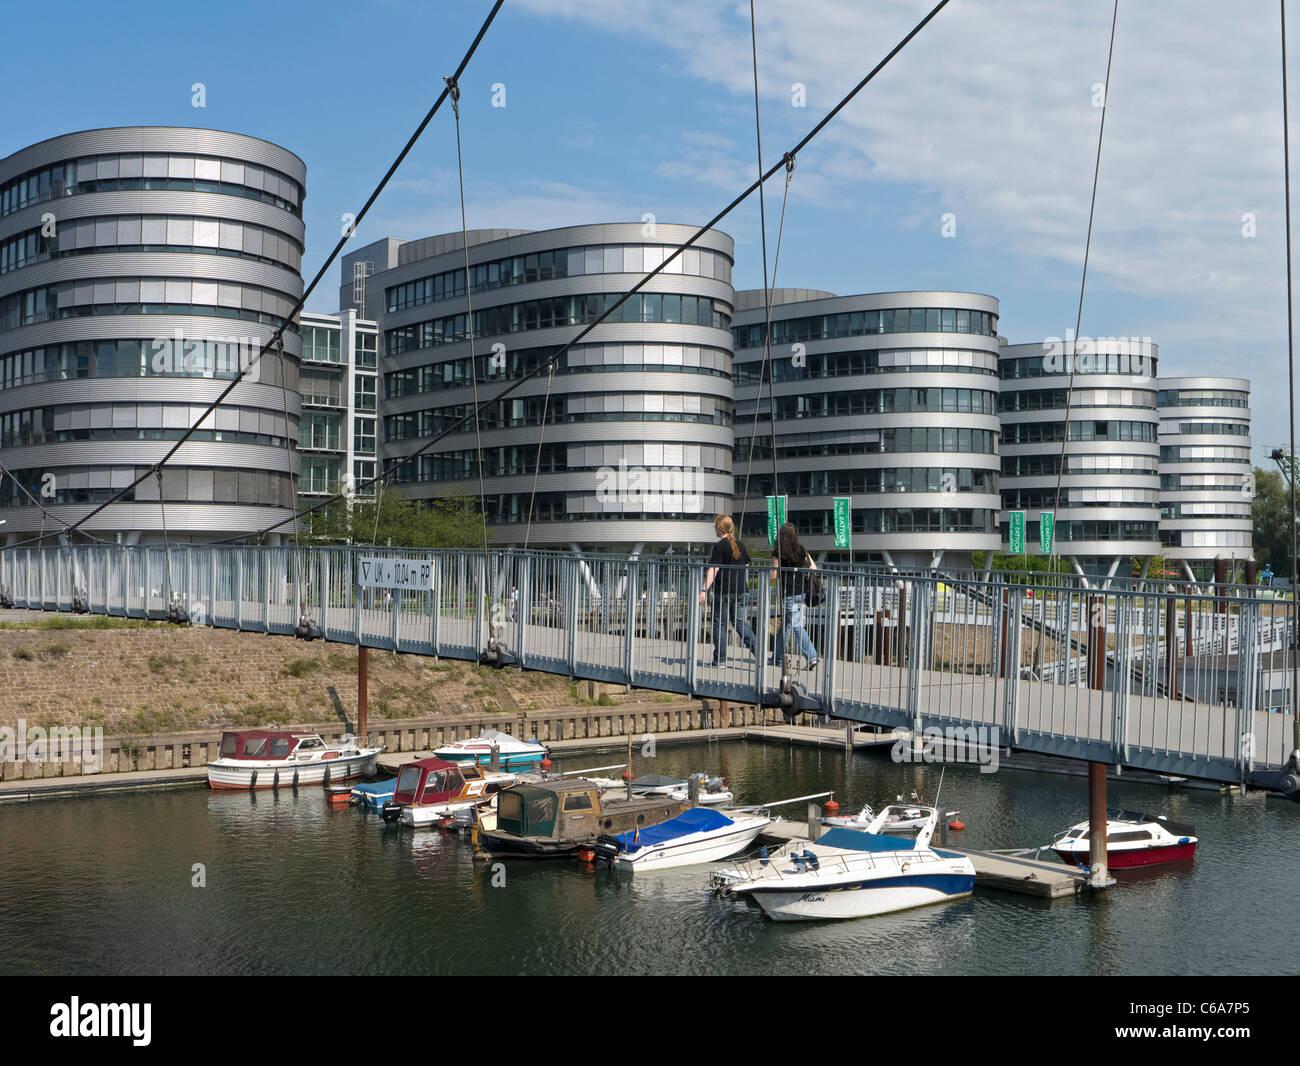 Modern footbridge and office buildings at Innenhafen area of Duisburg in North Rhine-Westphalia Germany - Stock Image